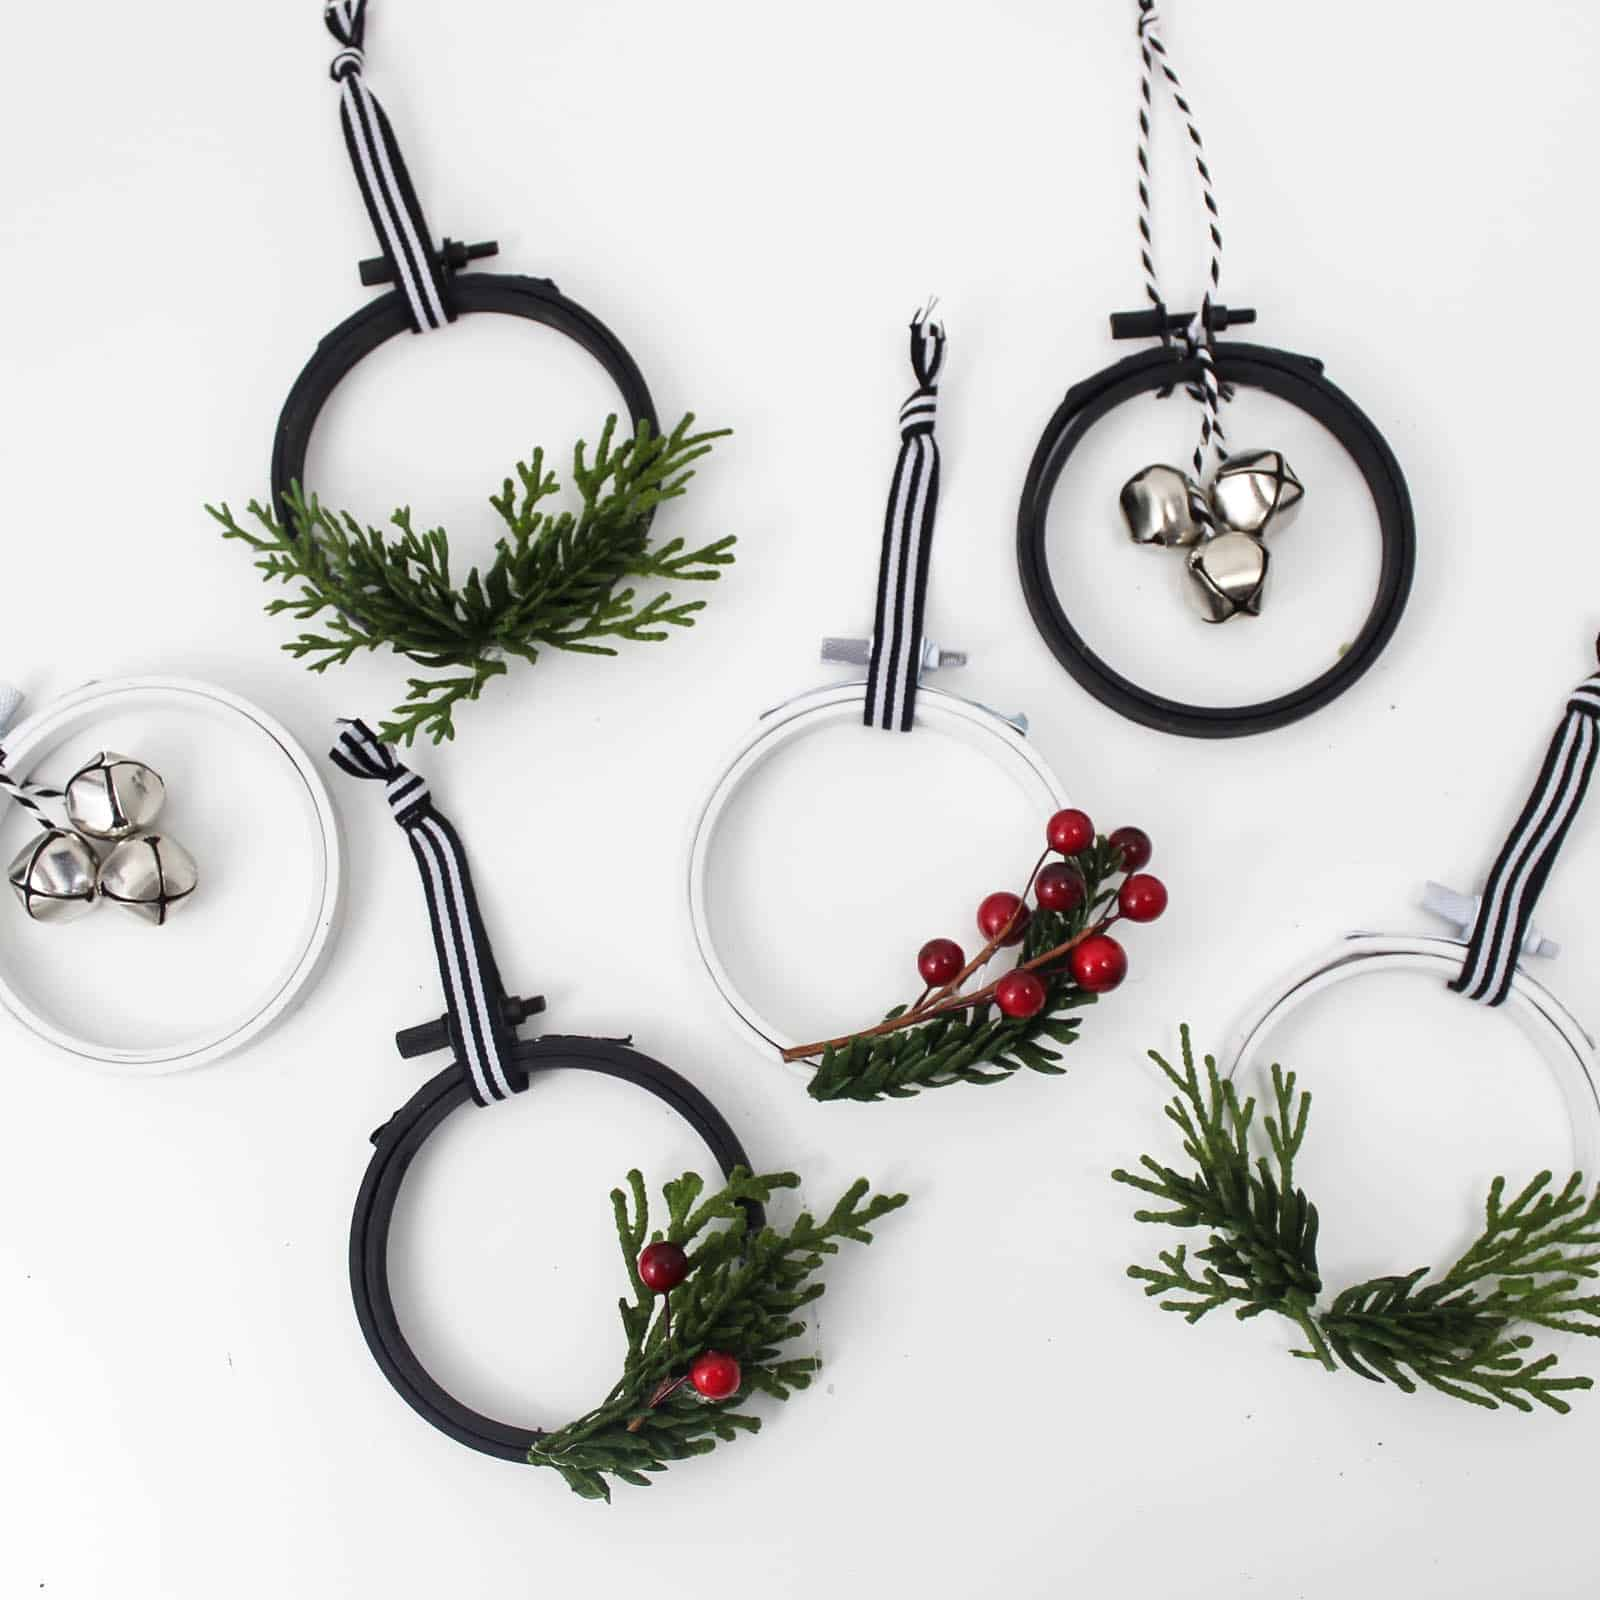 DIY Mini Wreath Ornaments